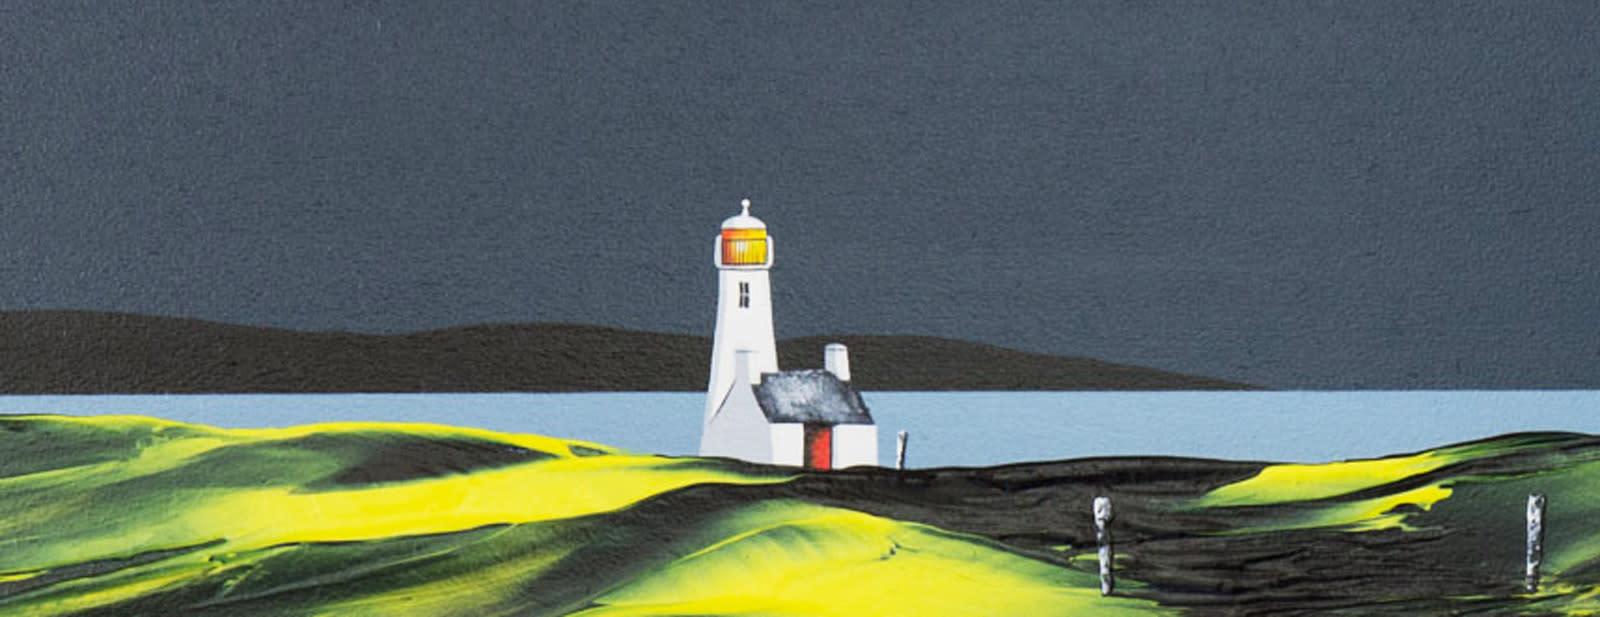 Watch Lighthouse